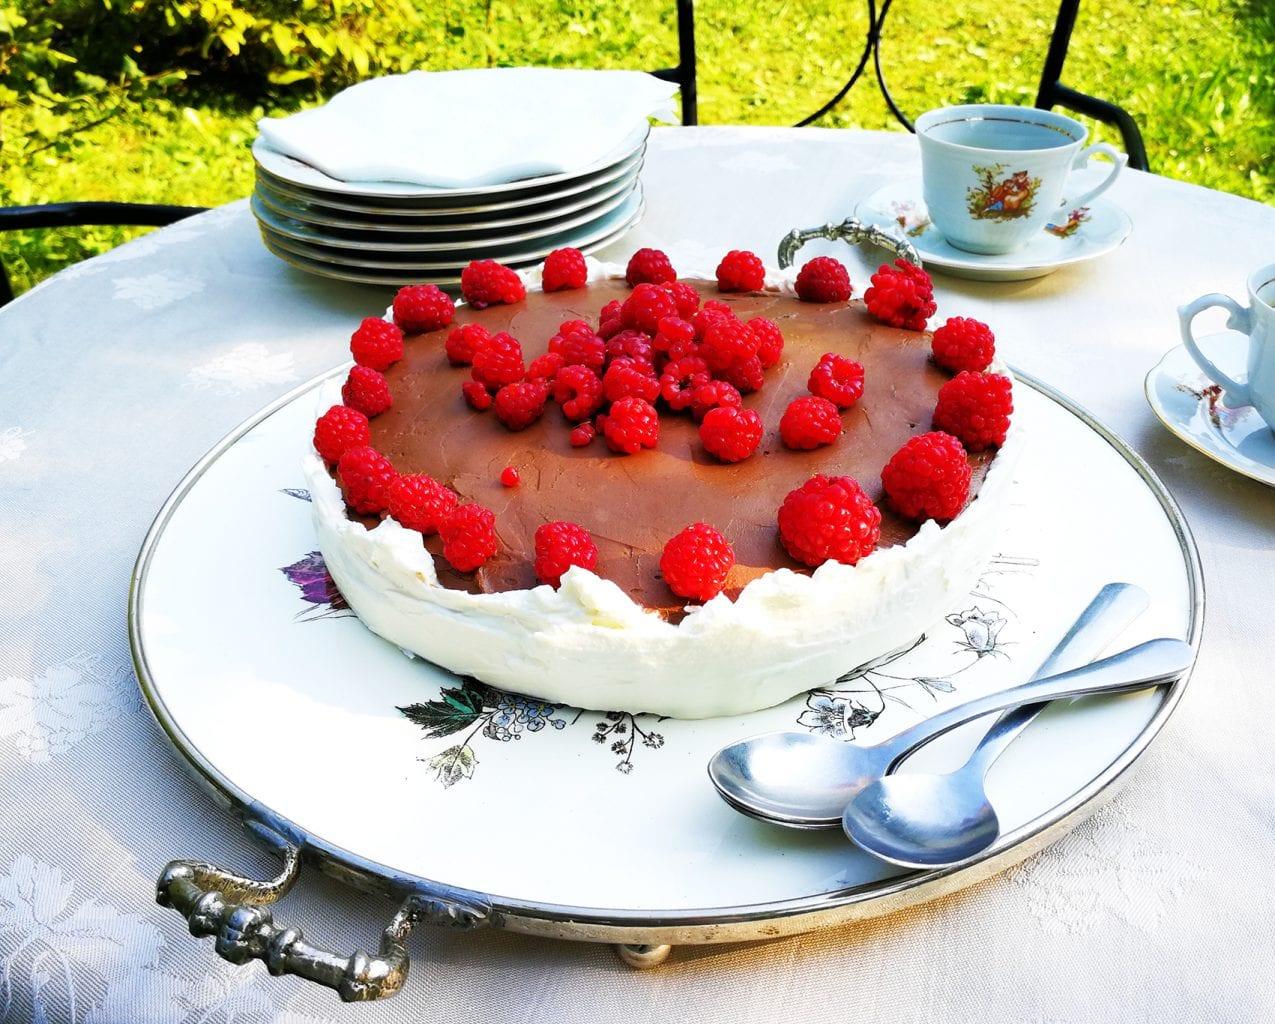 torta v parížskom štýle recept